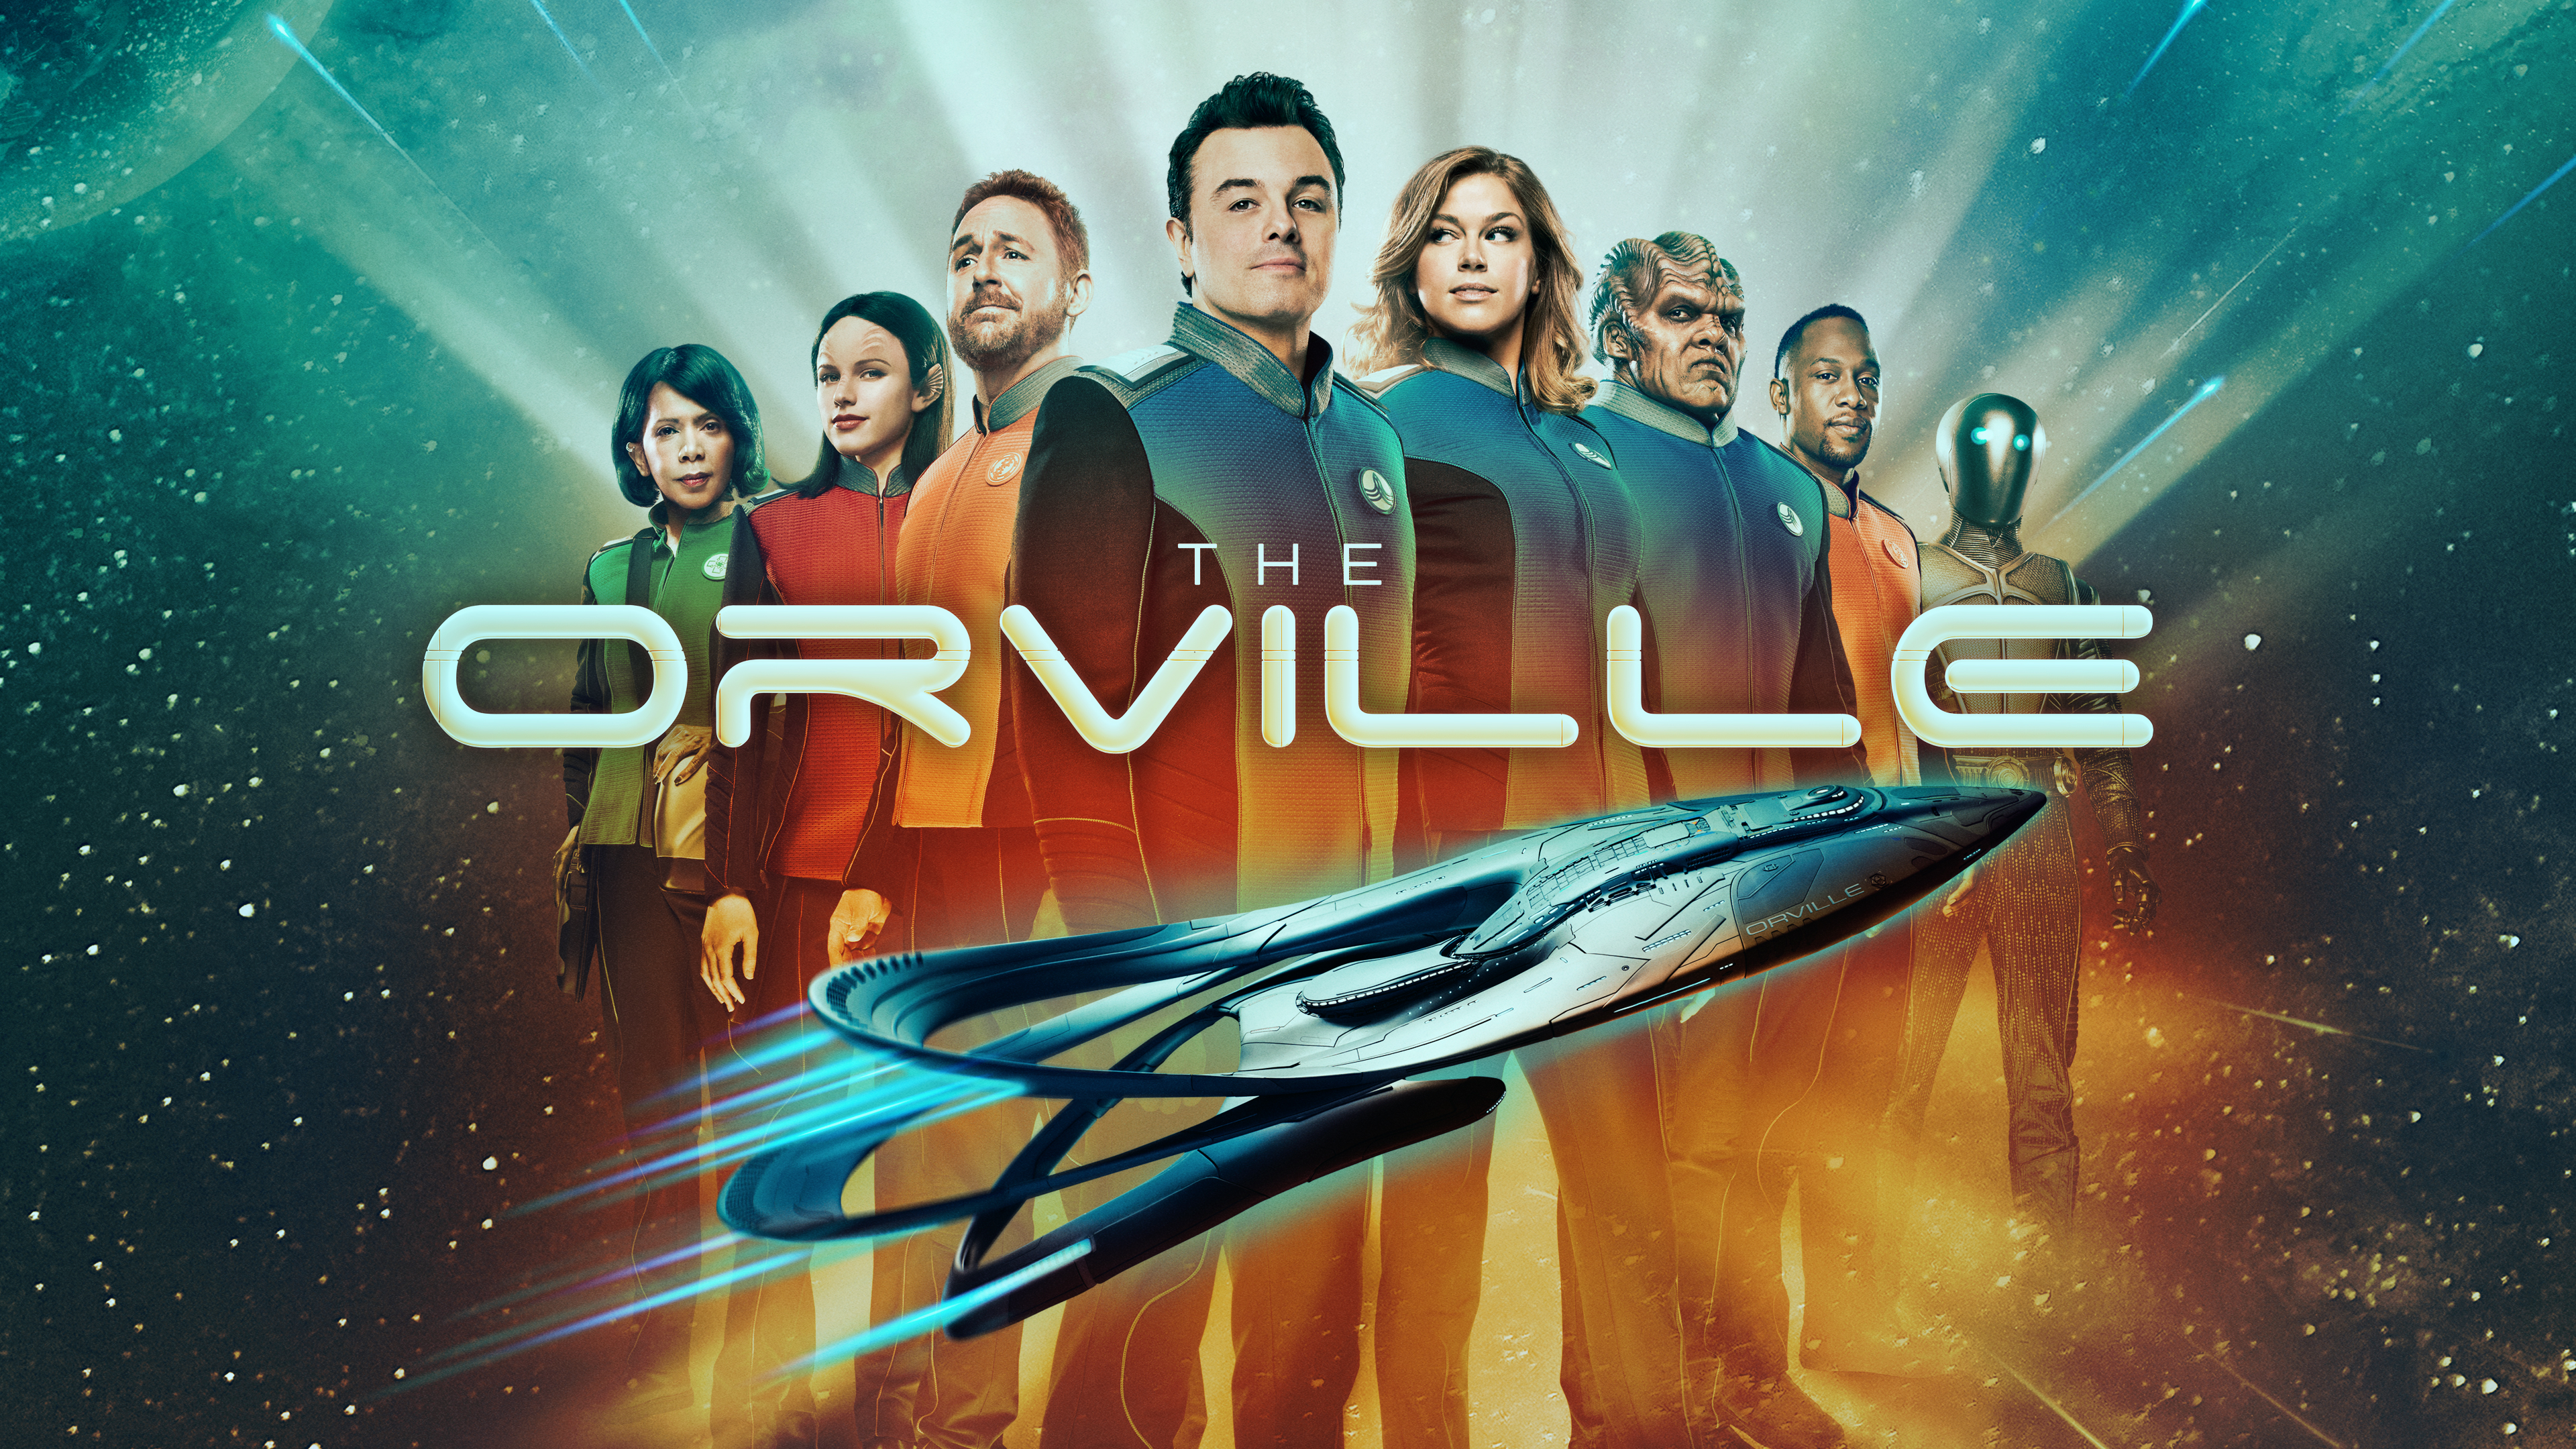 The Orville Crew.jpg